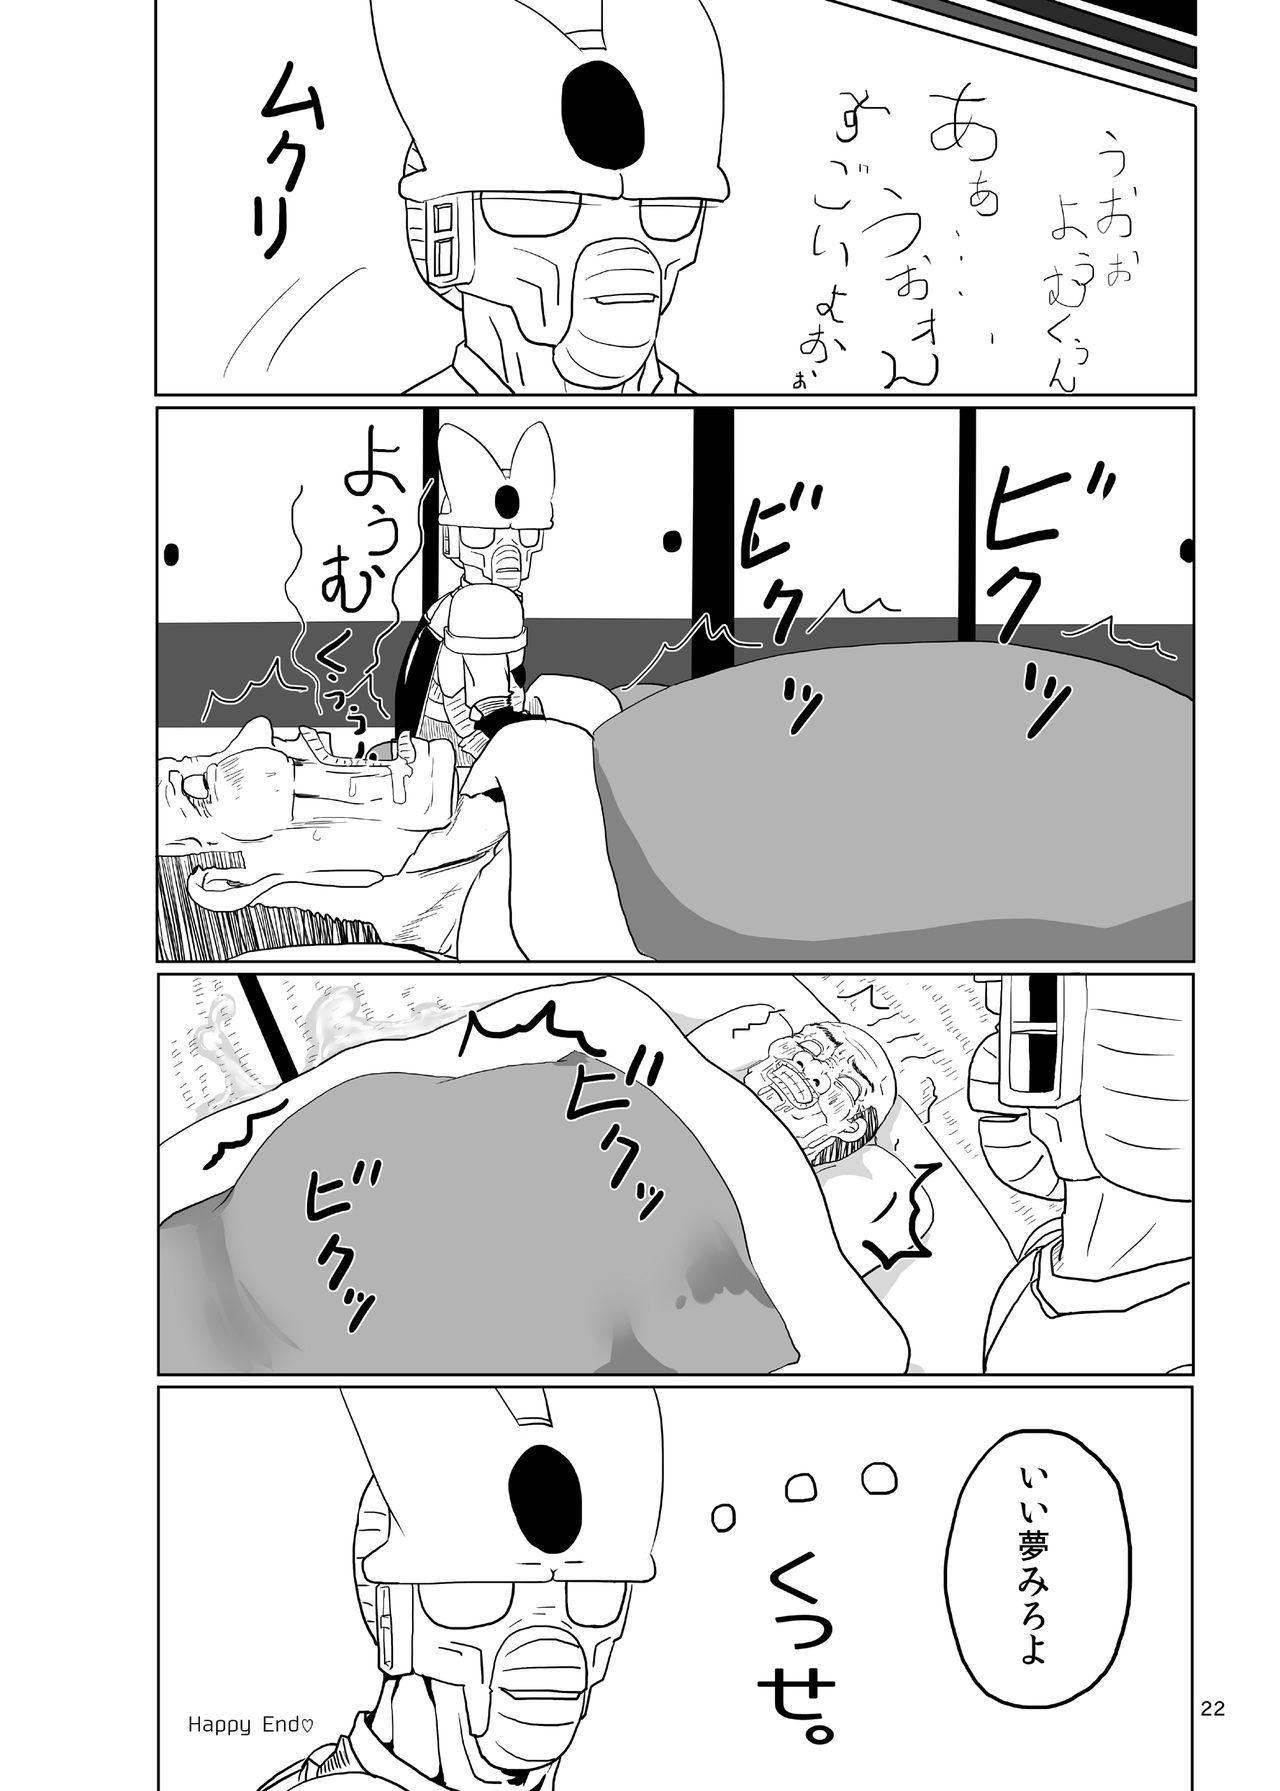 [Hayaku Byouin e Itte Kudasai. (Byoin)] Youmu-kun (Juuyou) ni Shabutte Moraitai. (Touhou Project) [Digital] 22